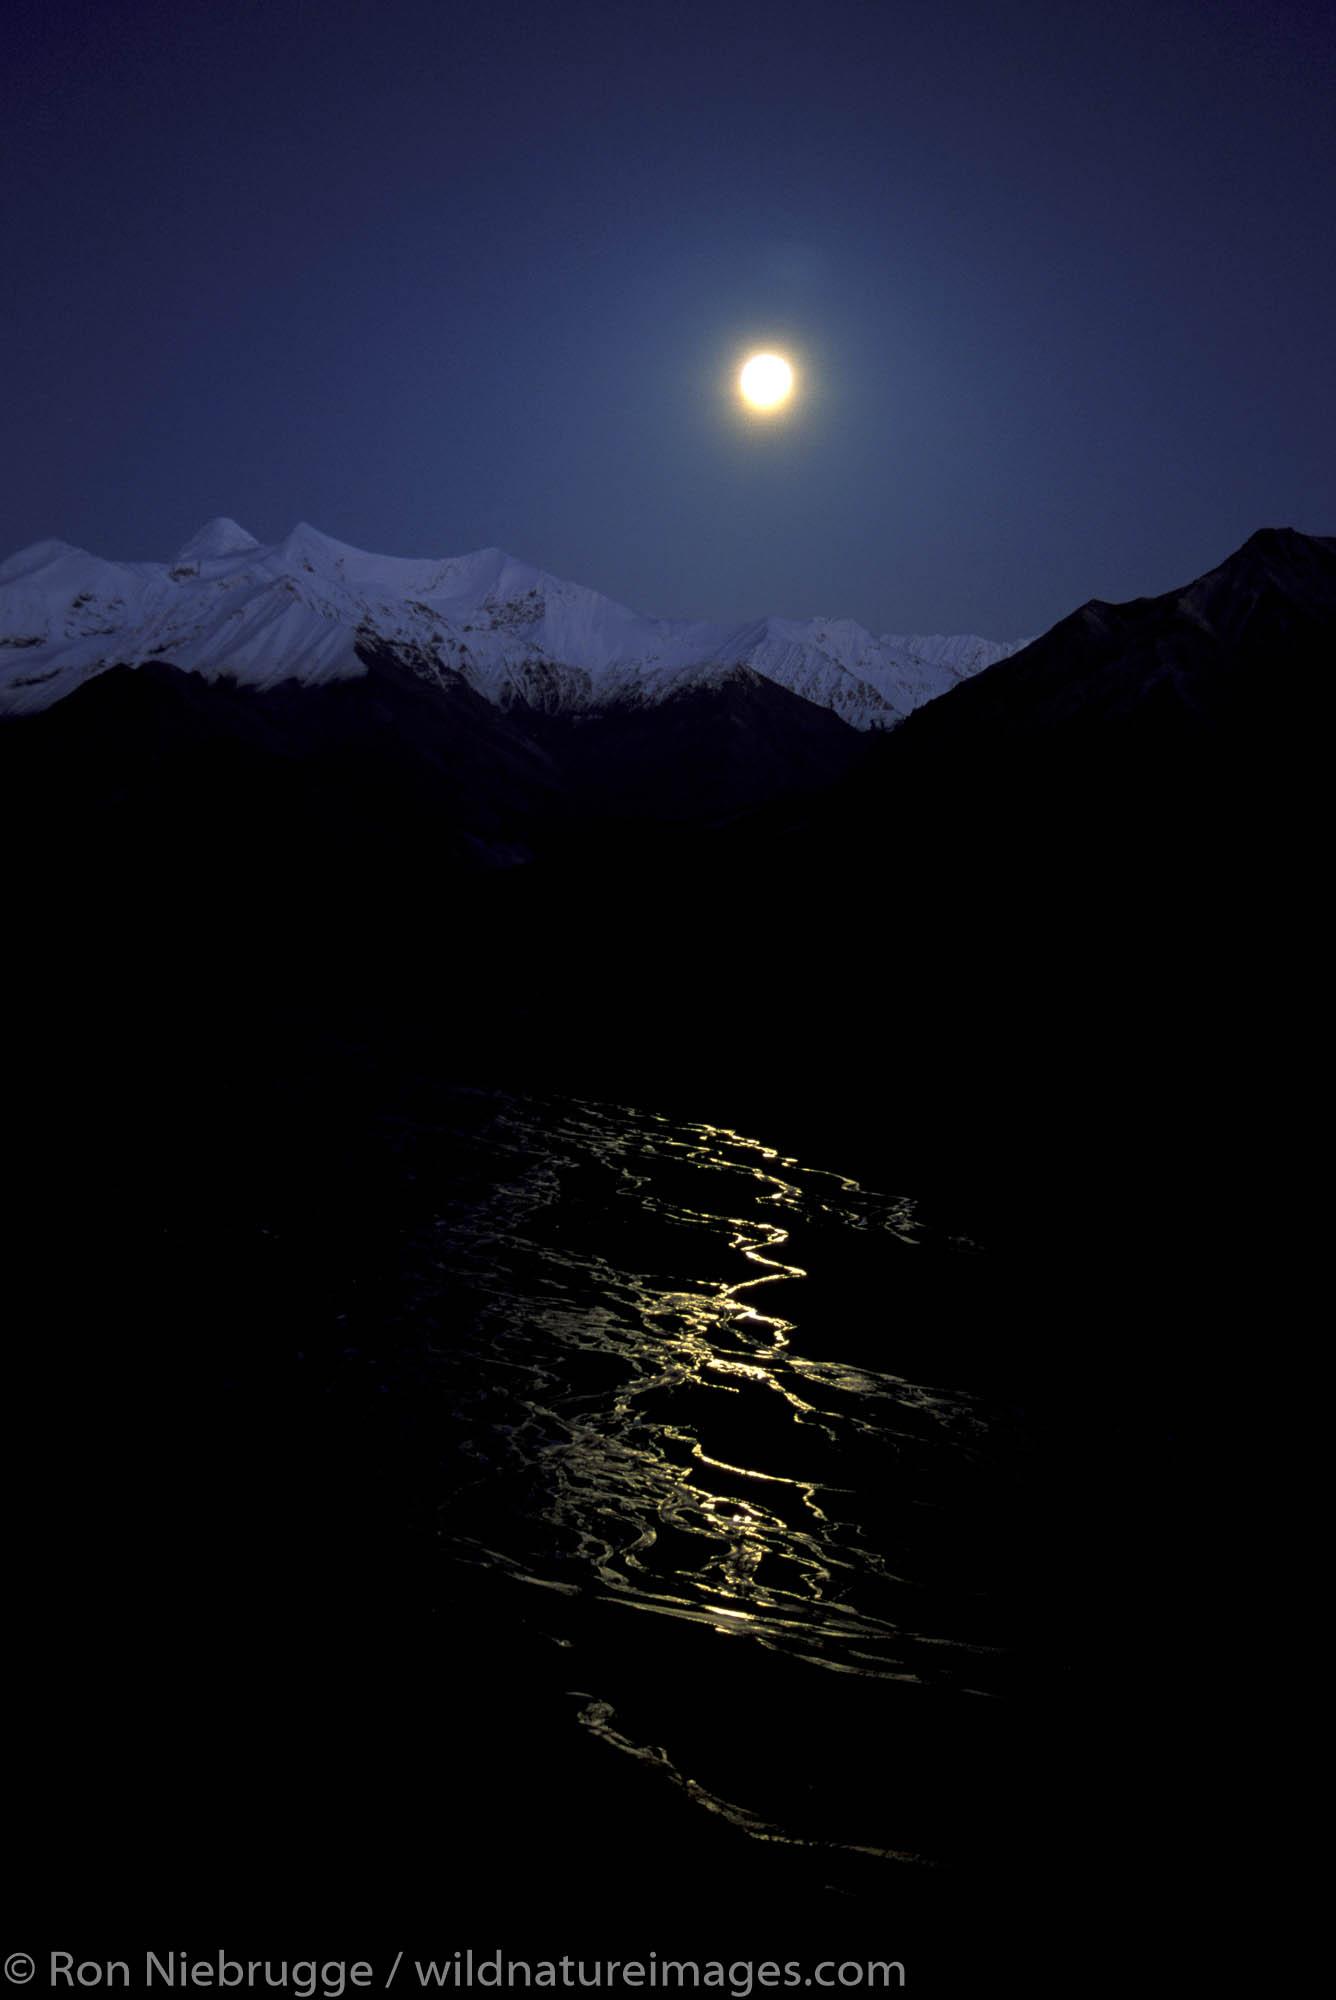 Full moon over the Alaska Range and the McKinley River, Denali National Park, Alaska.